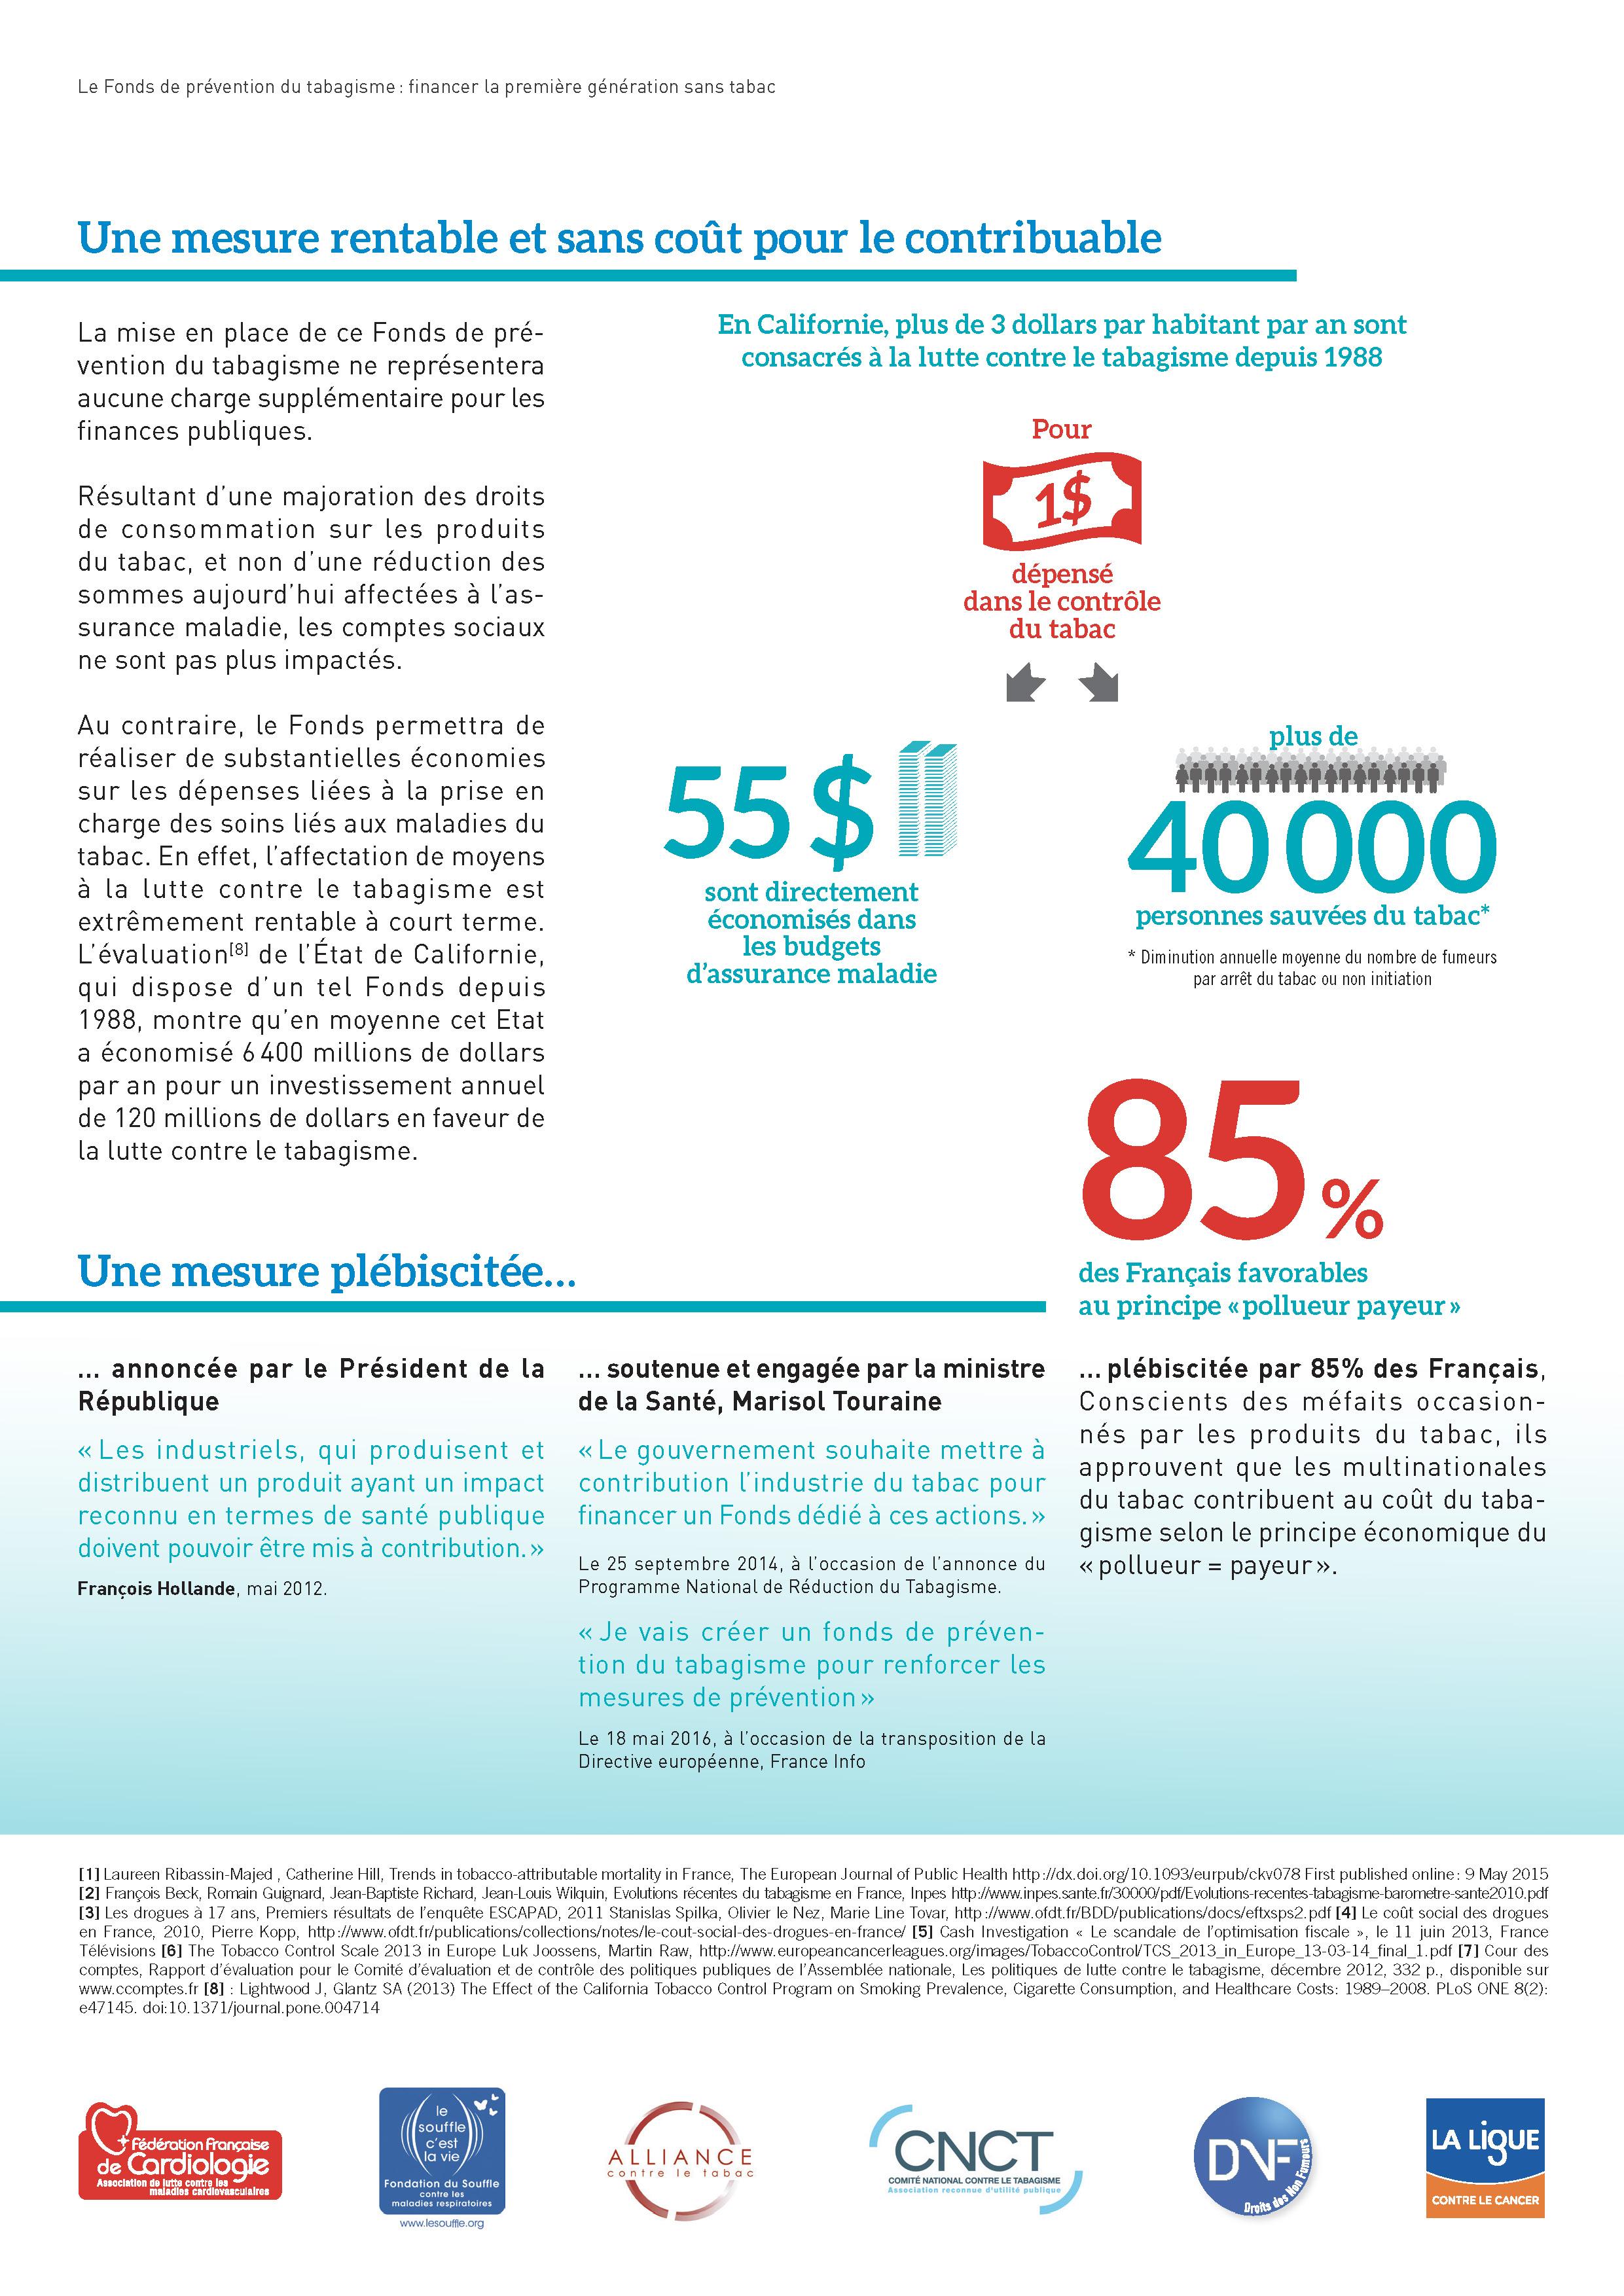 Alliance-DP_journee-mondiale-sans-tabac-avec-annexes-vf-30mai2016_Page_21.jpg